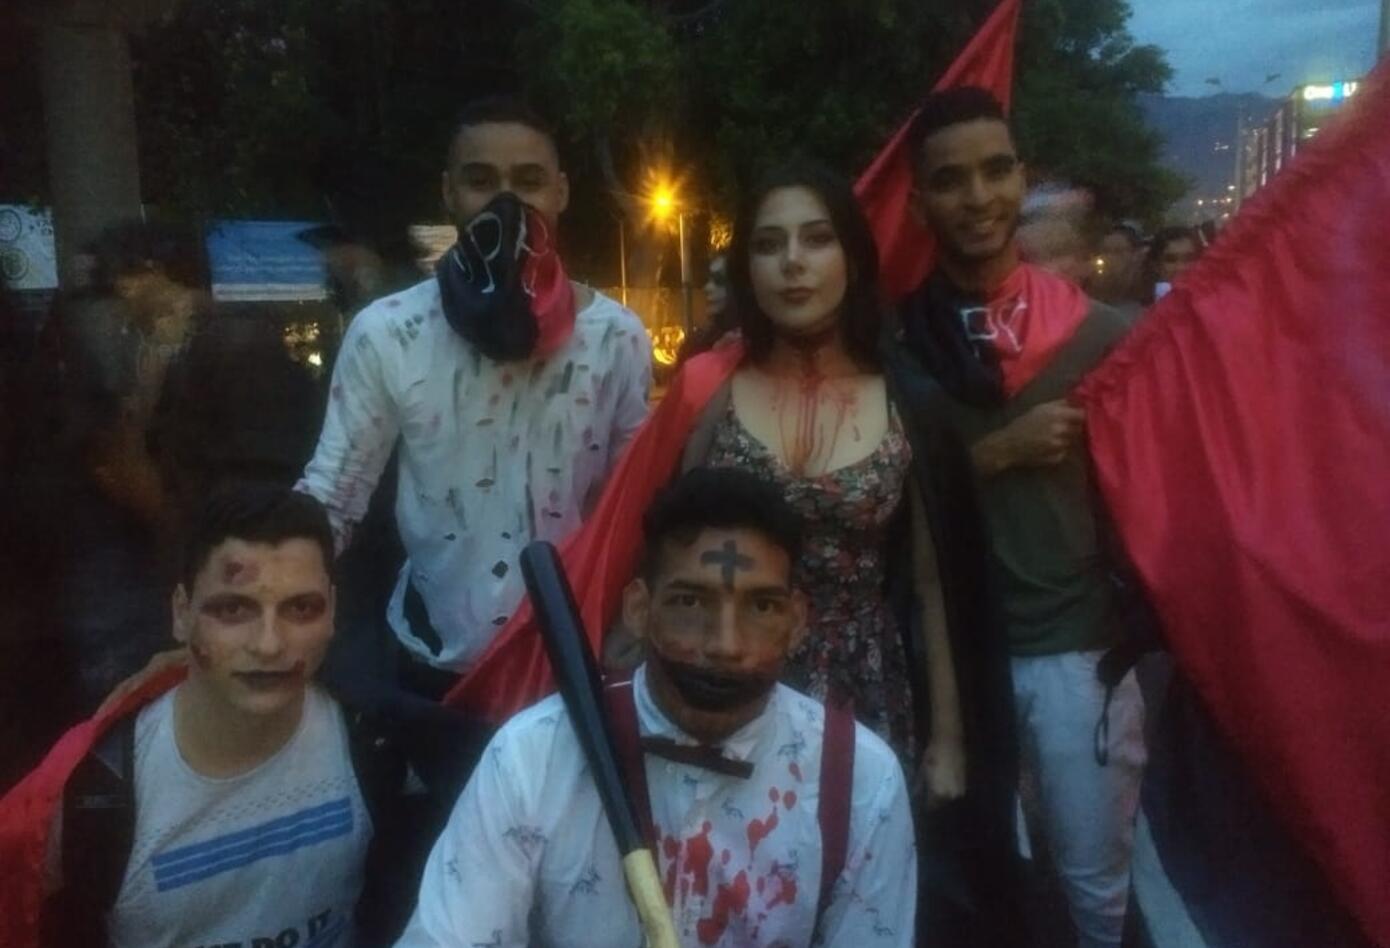 Marcha zombie en Medellín.